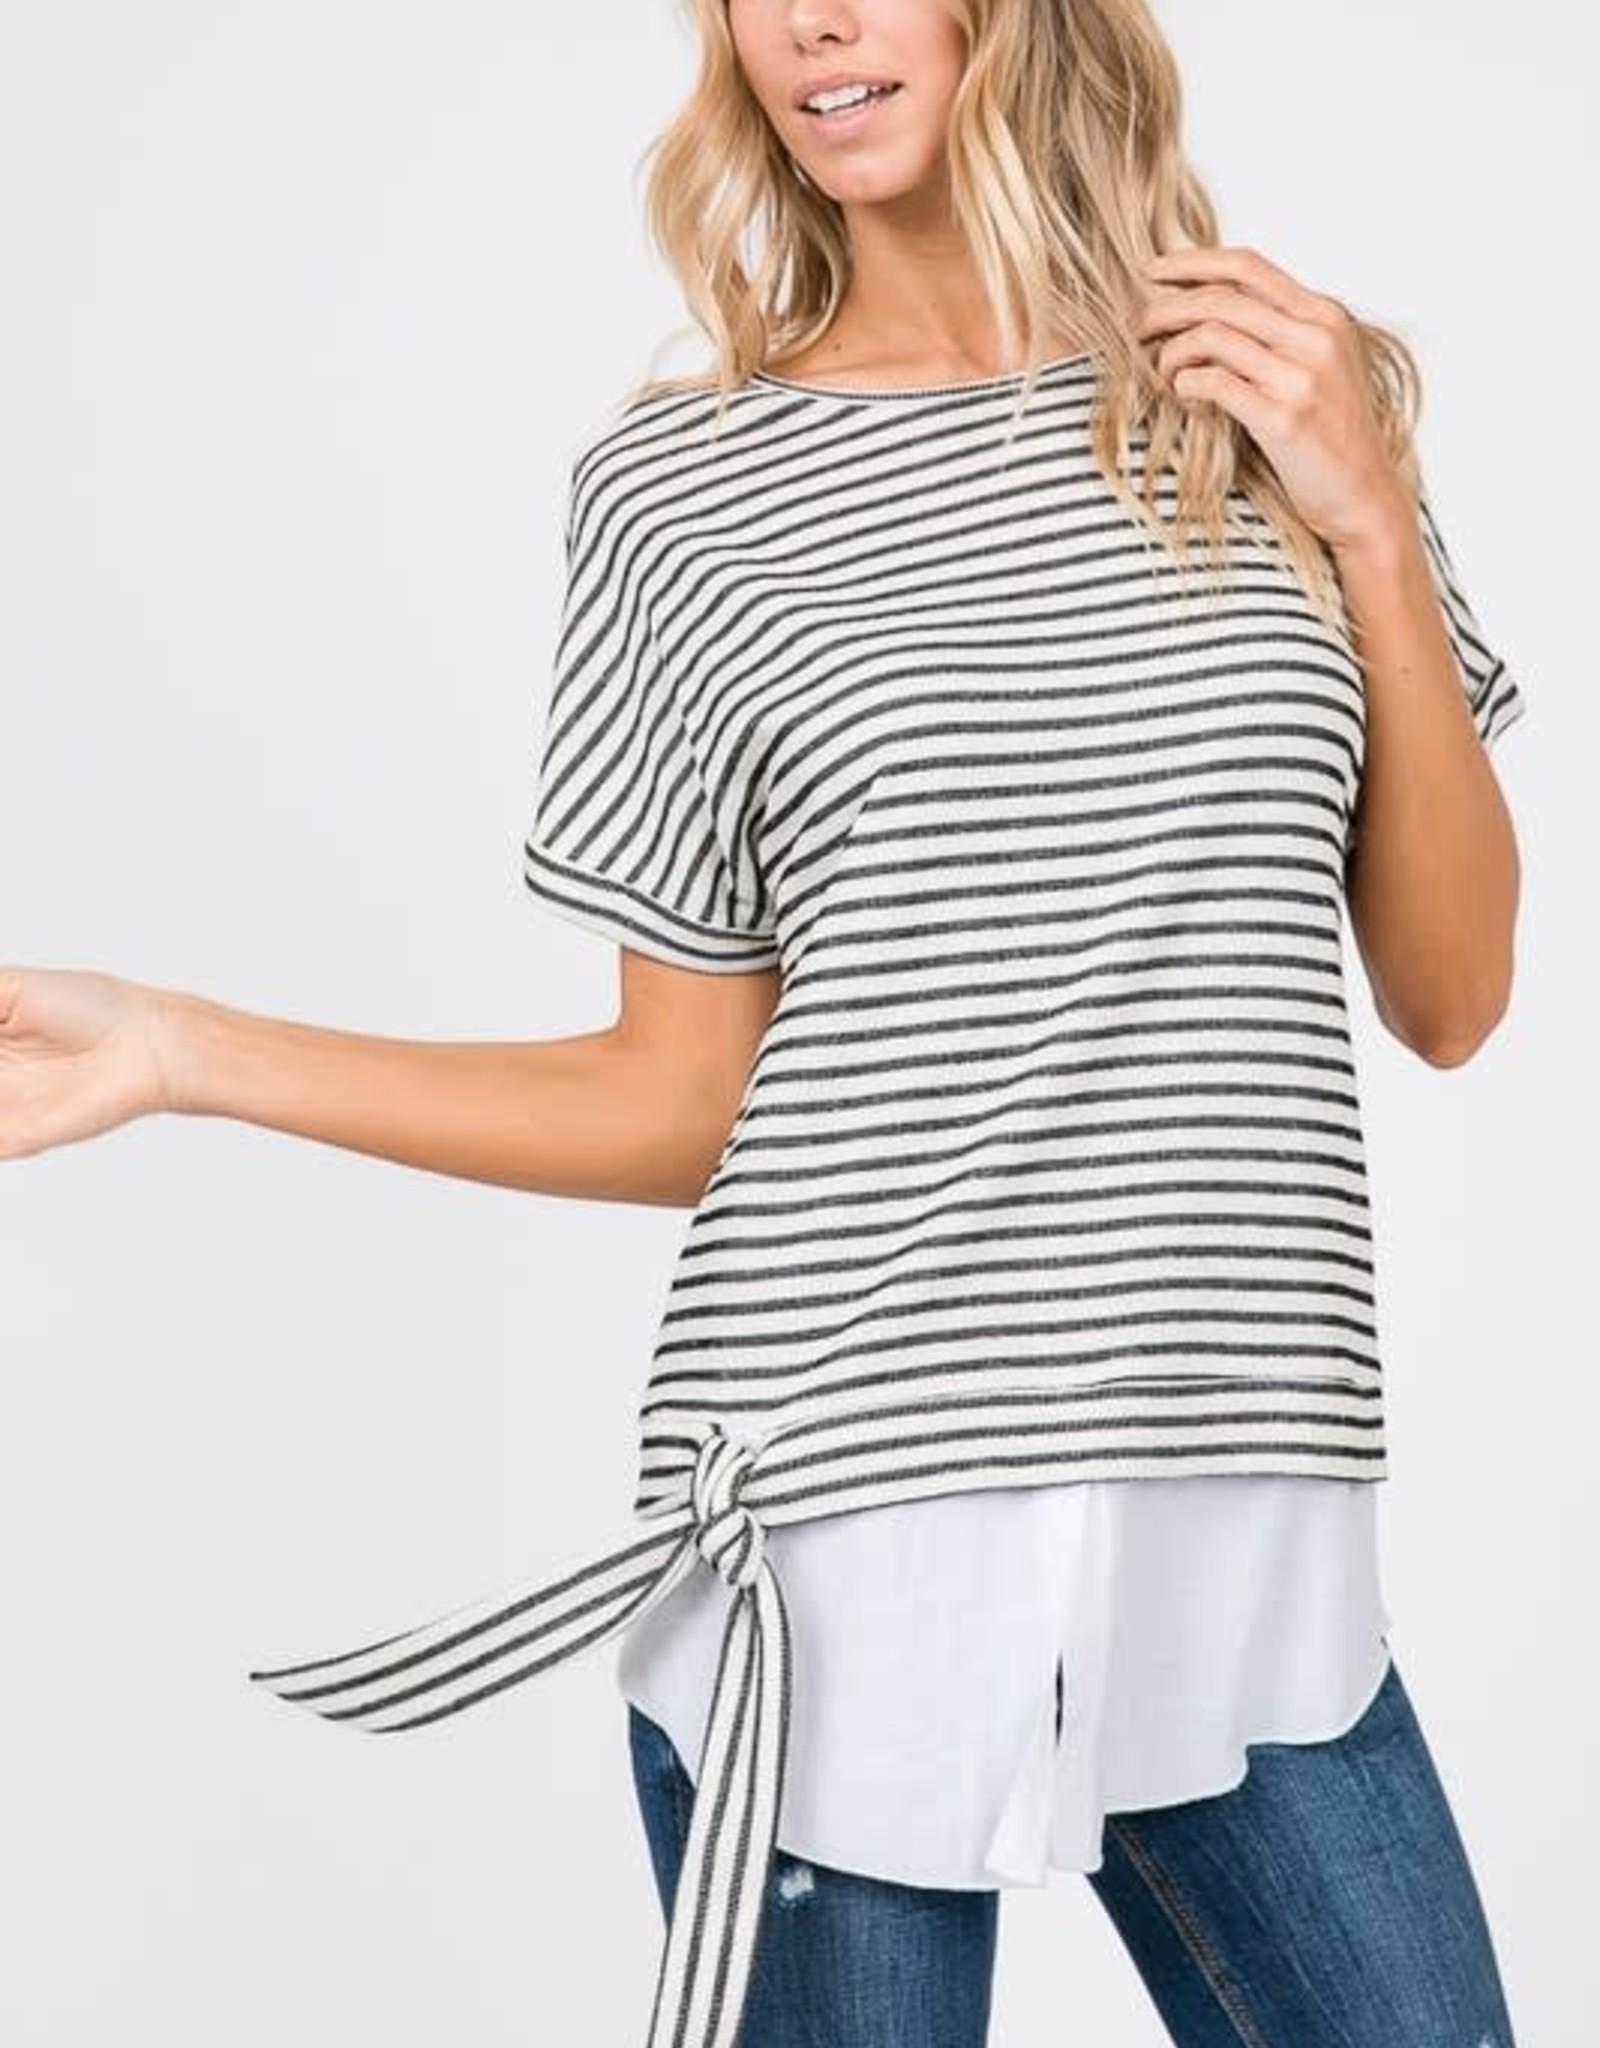 Side Tie Knit Top with Long Hem